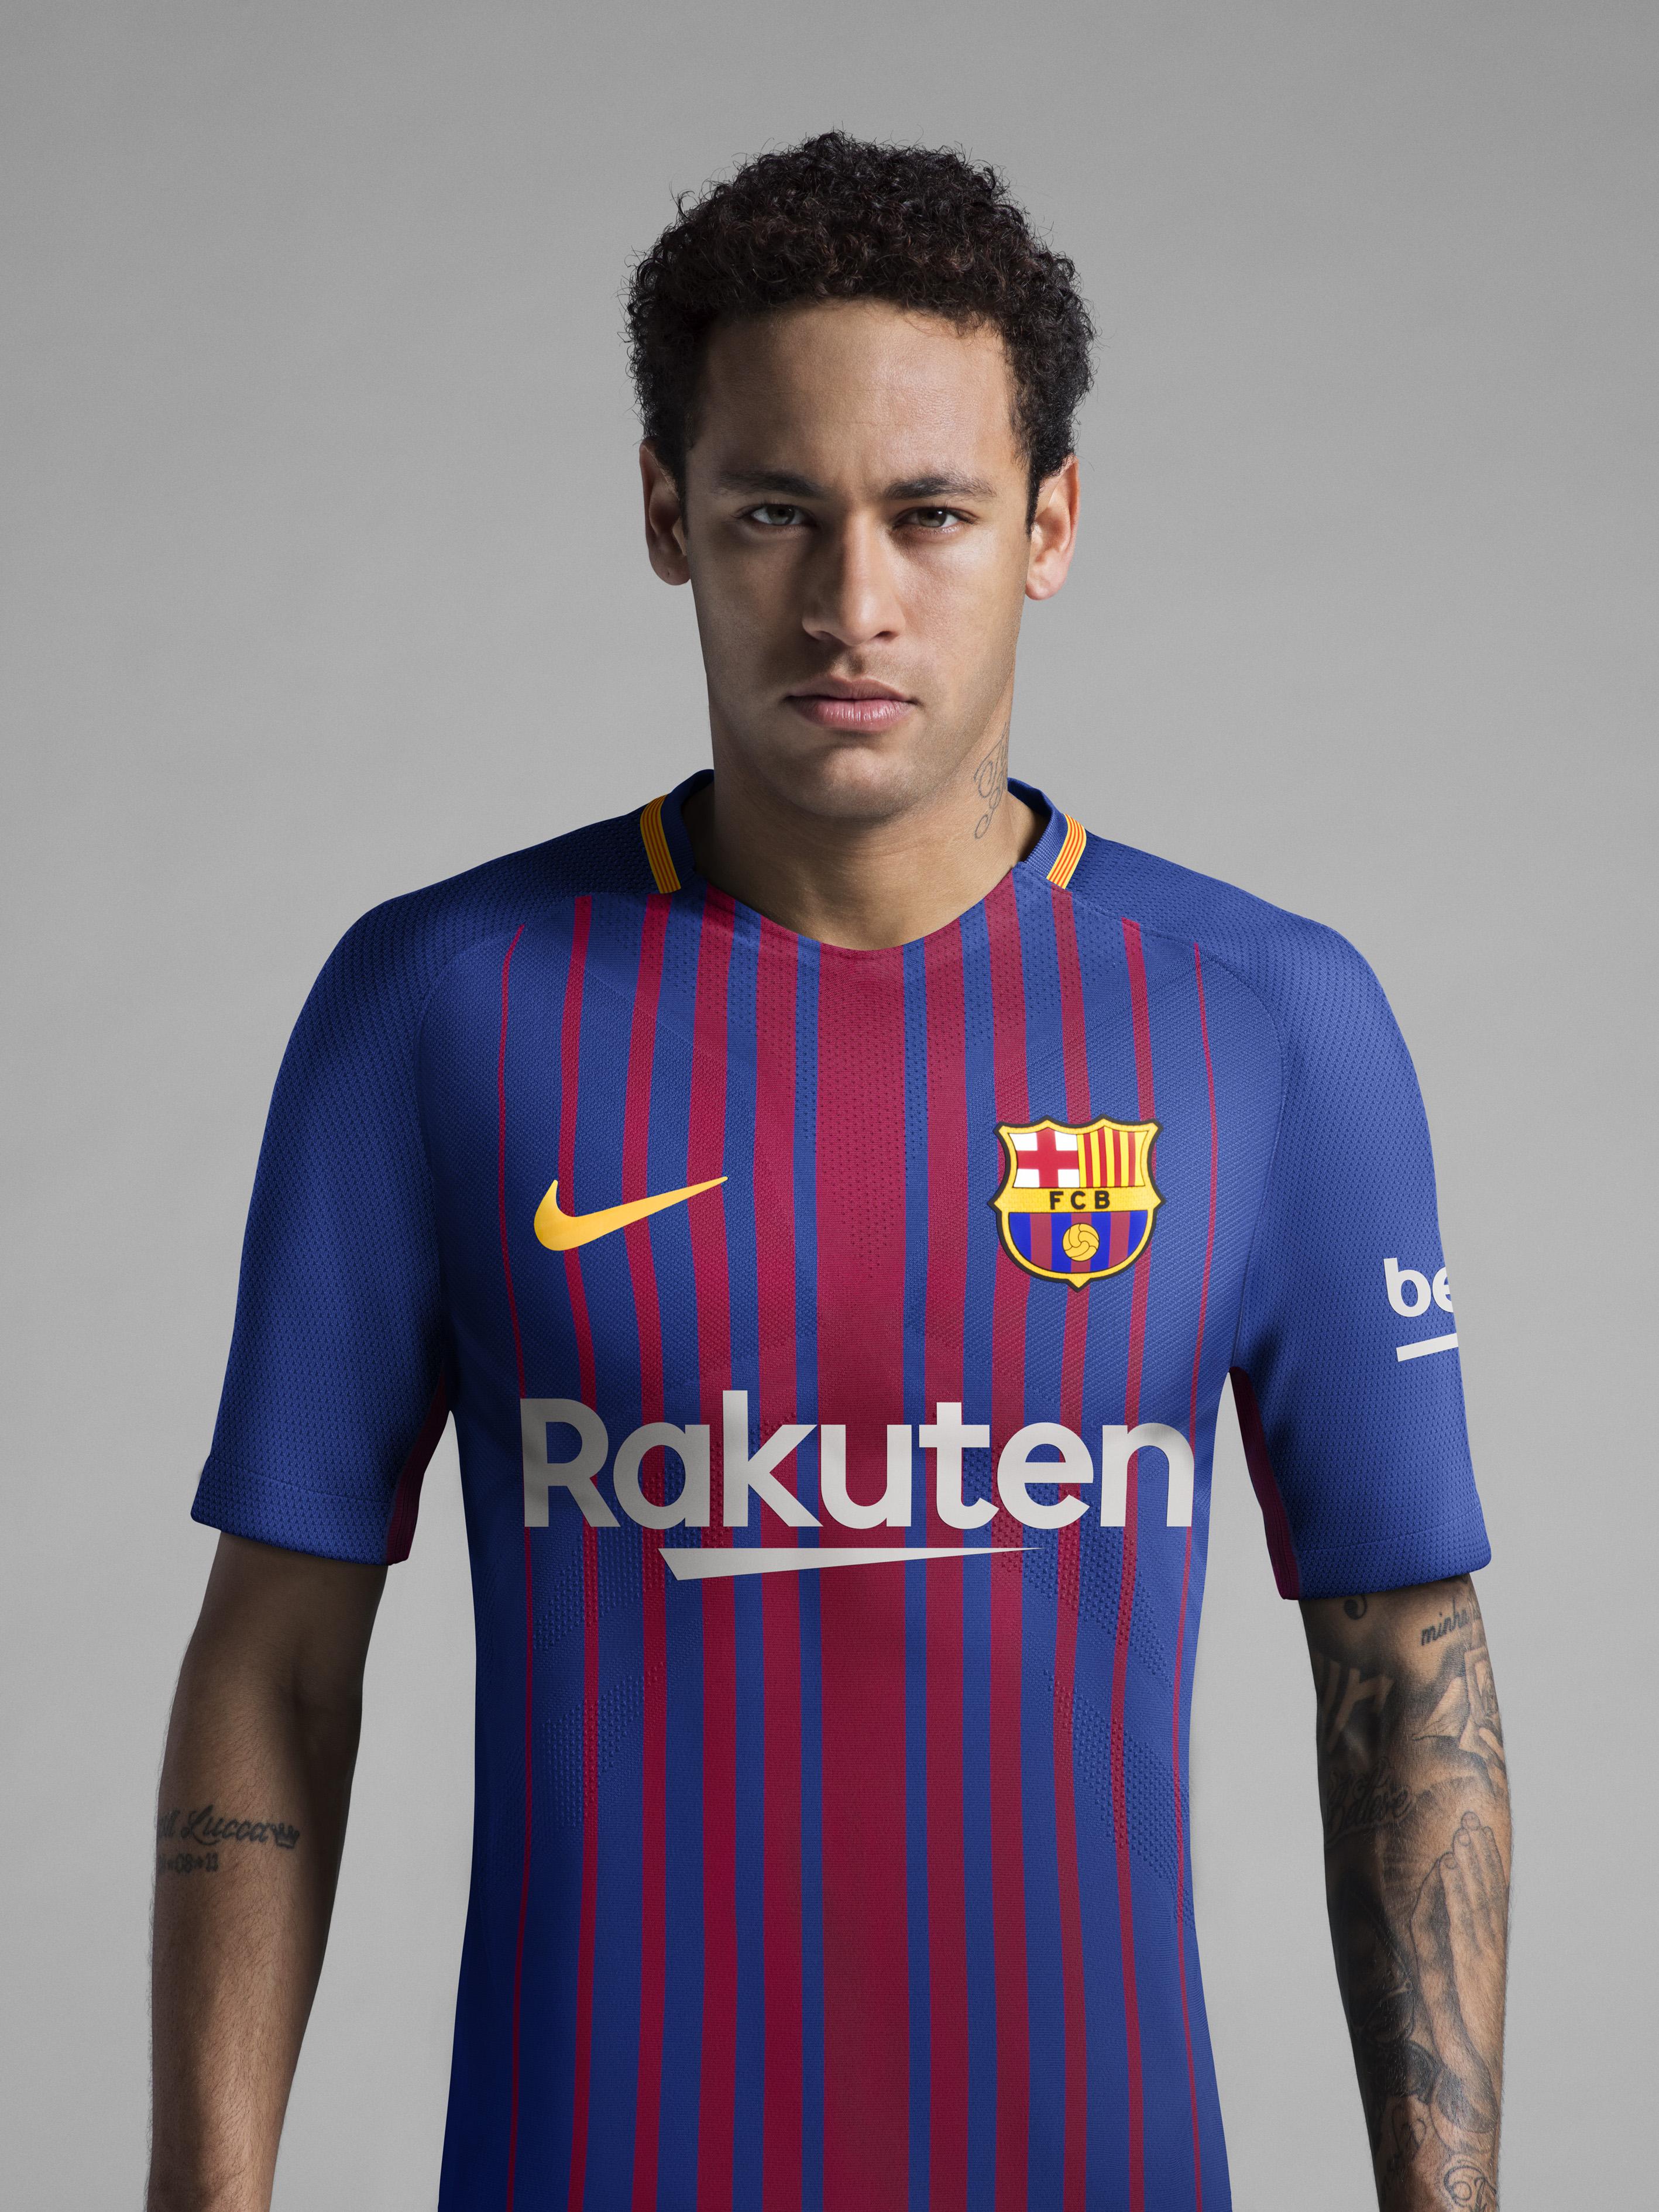 Maillot Nike Football FC Barcelona Neymar 2017-2018